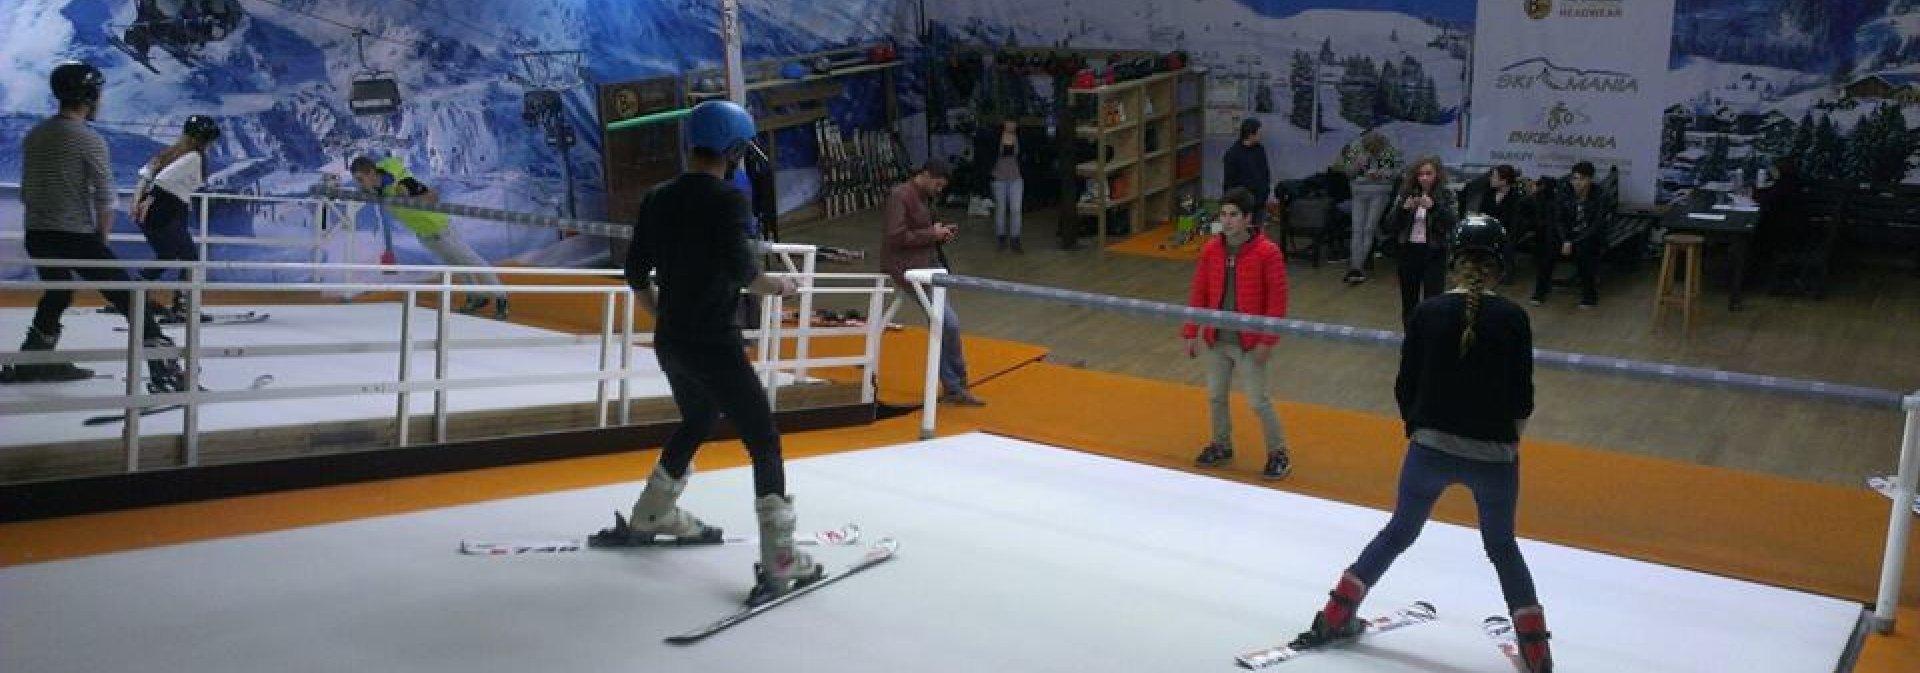 Ski-Mania, Iași